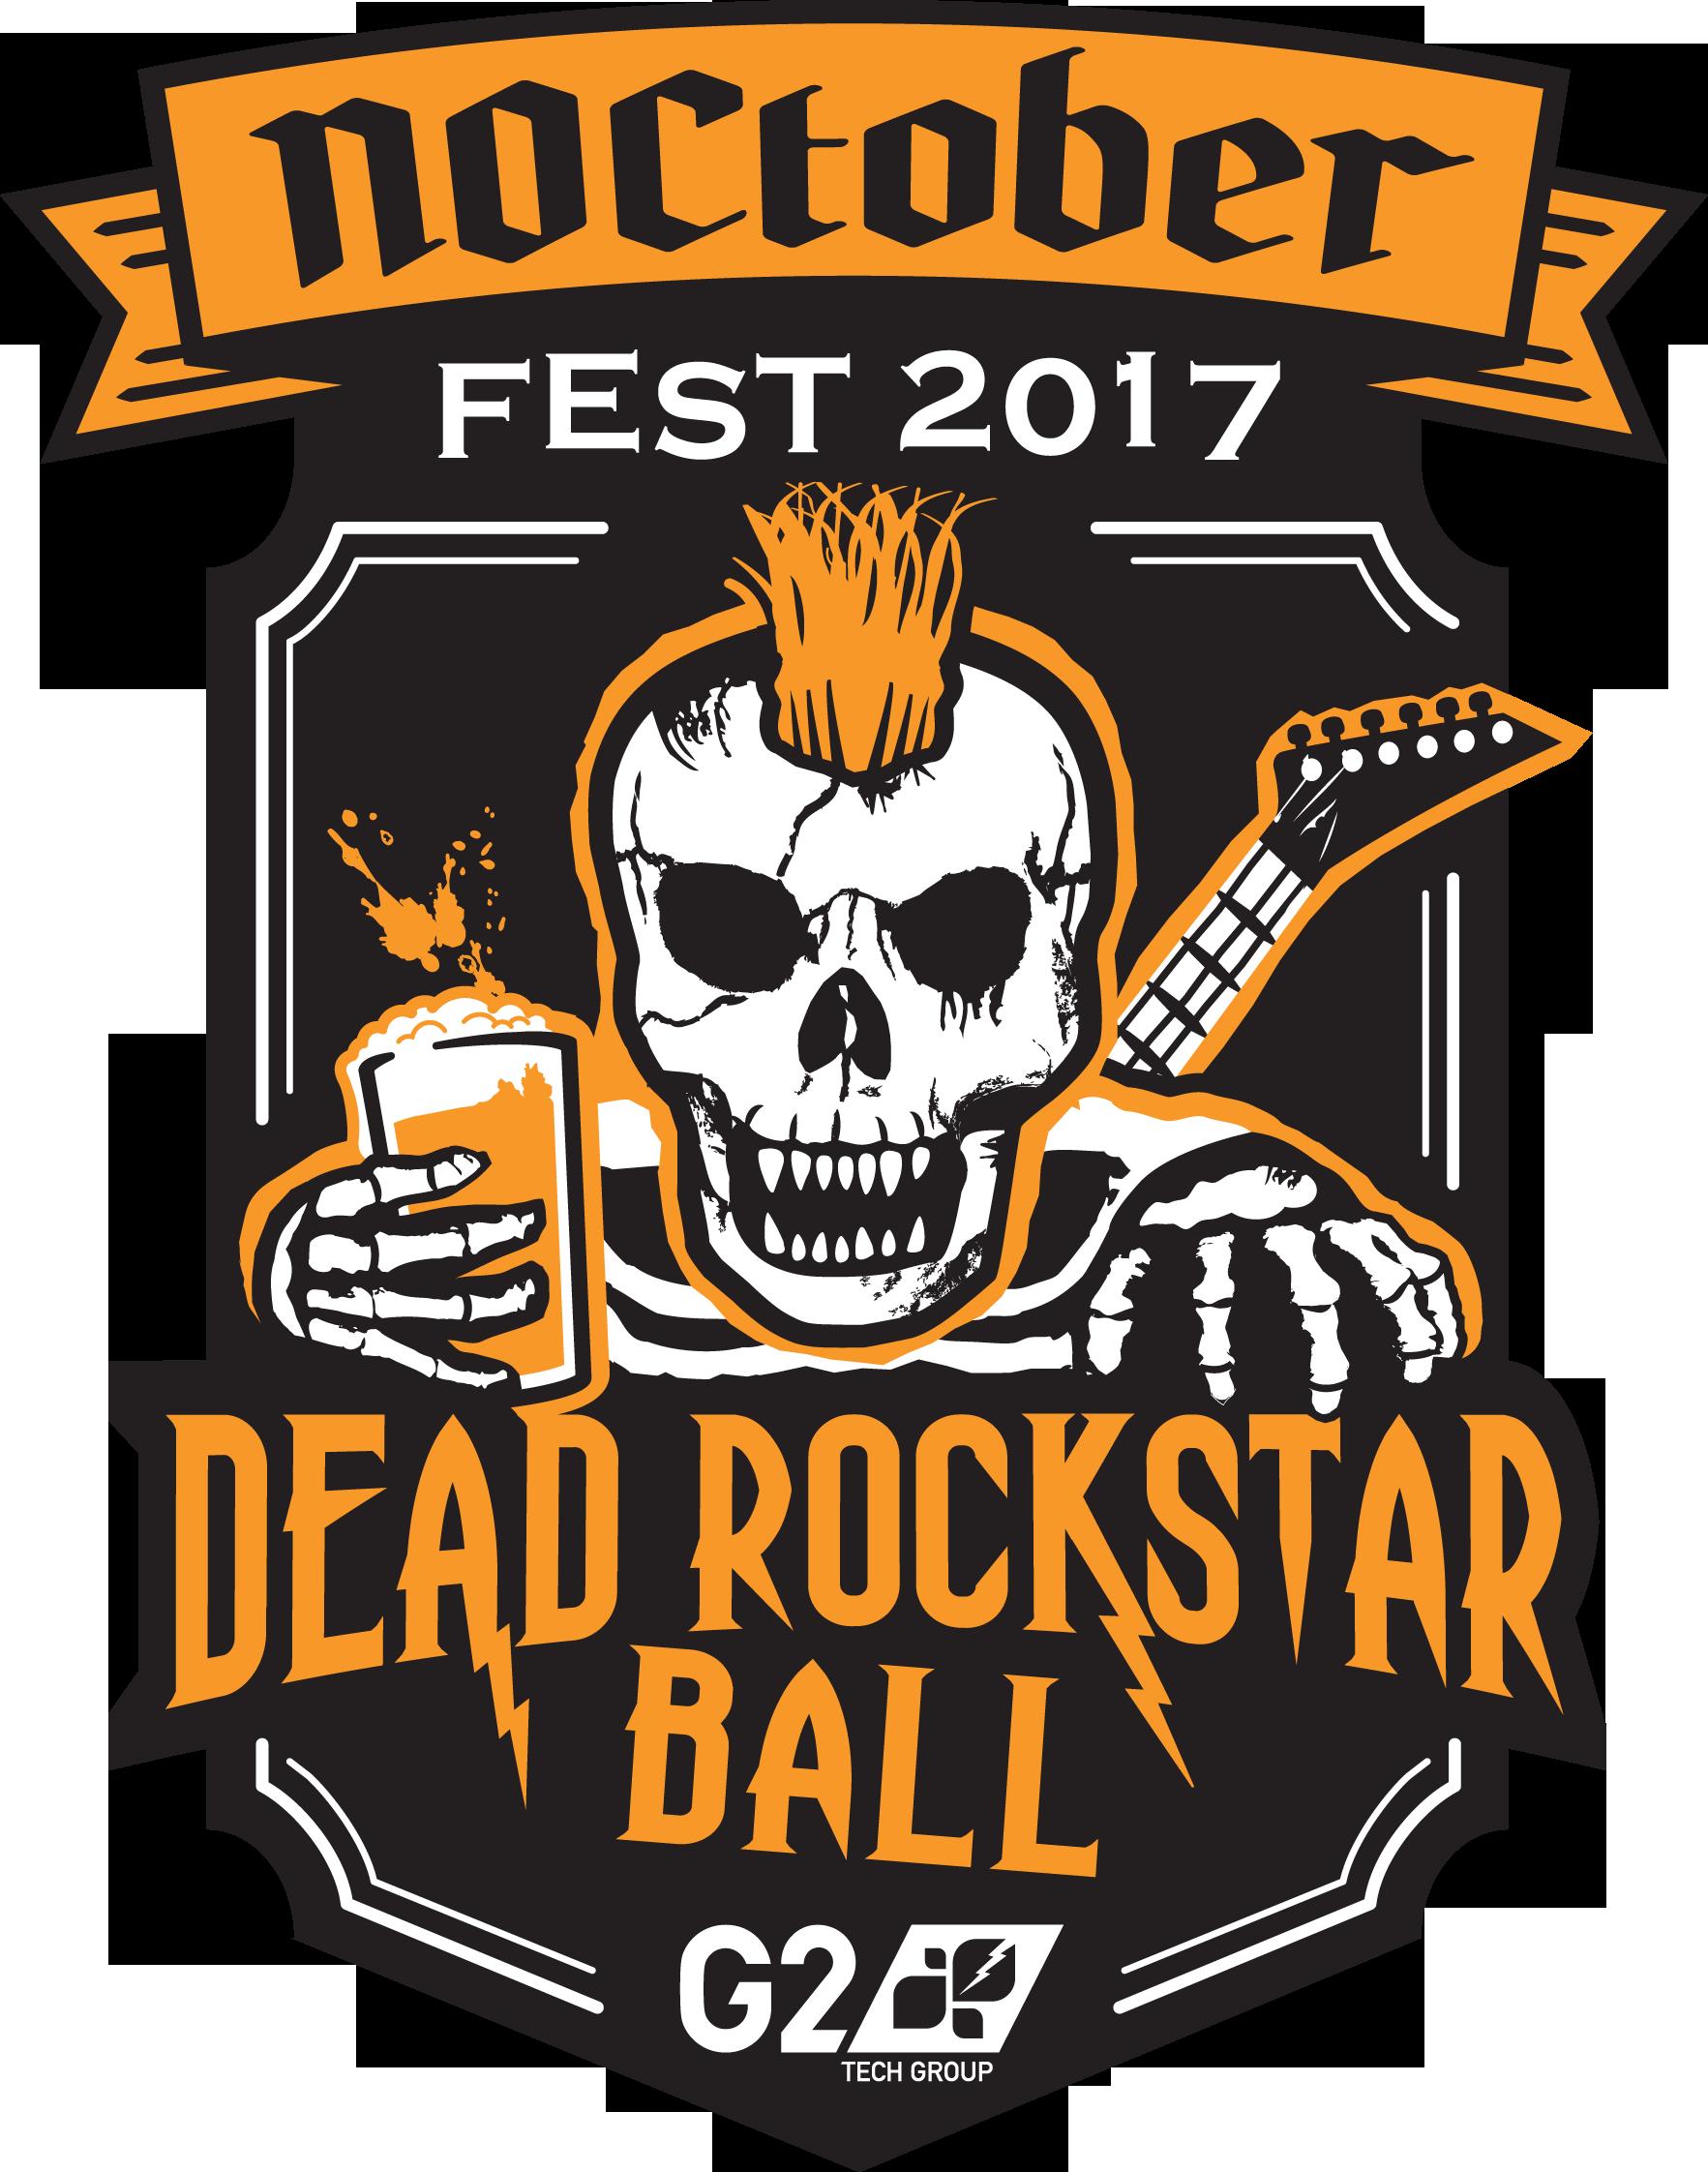 """Dead Rockstar Ball"" Pint glass for fun tech company"